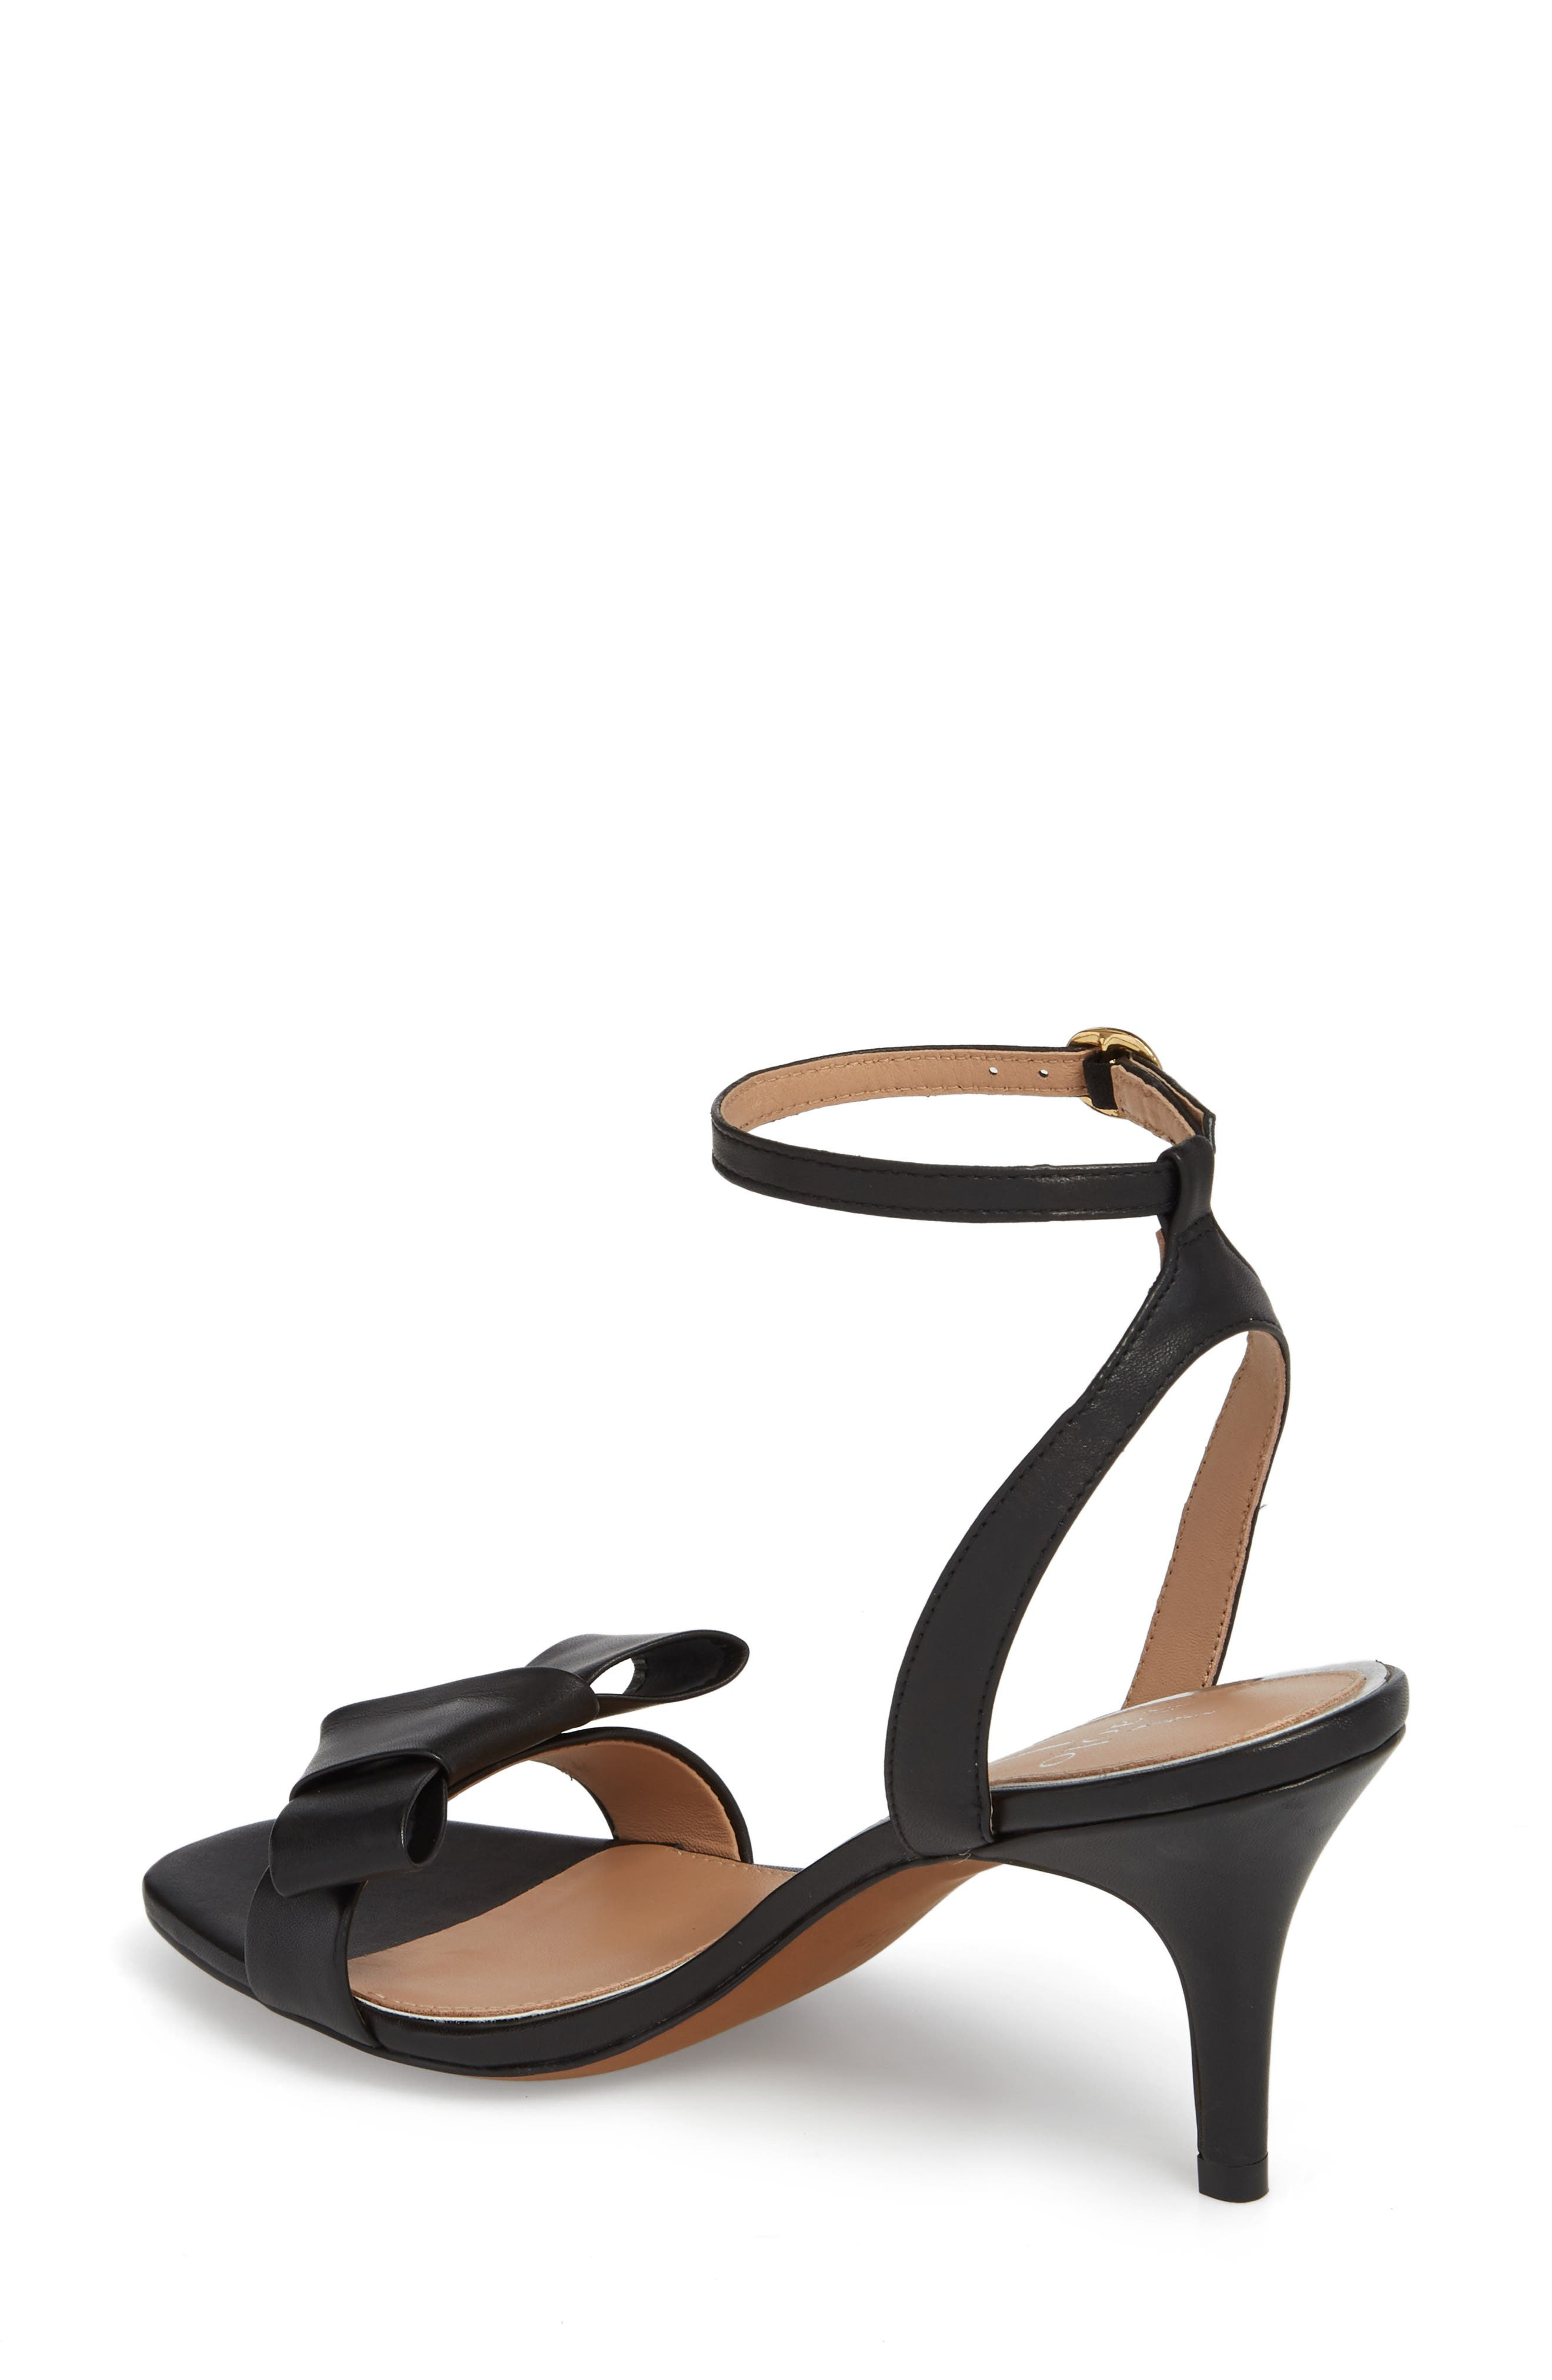 Haven Ankle Strap Sandal,                             Alternate thumbnail 2, color,                             BLACK LEATHER